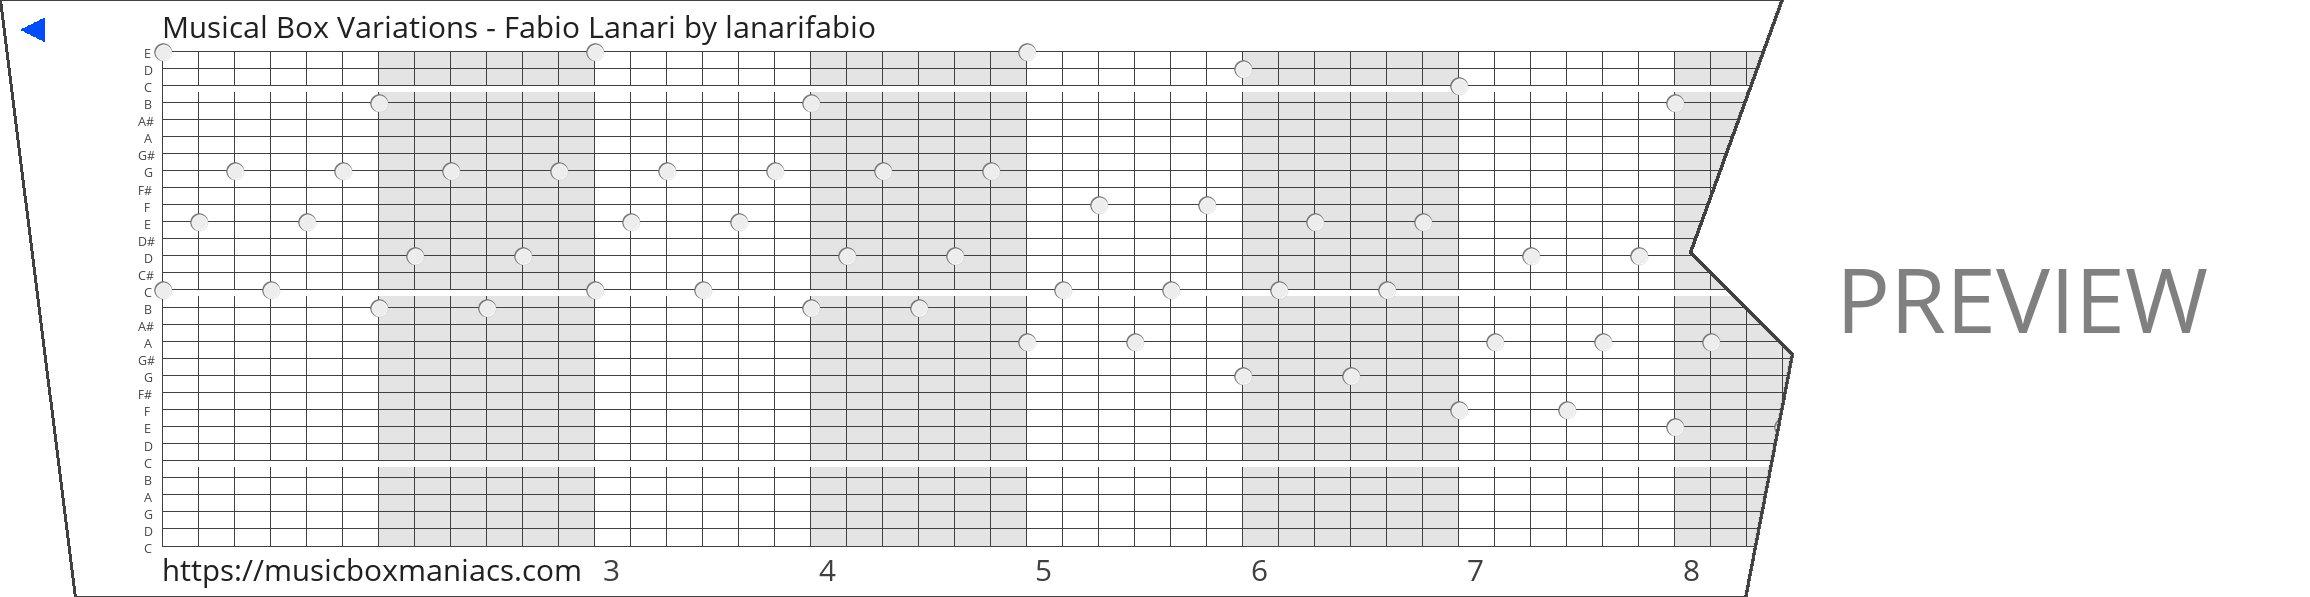 Musical Box Variations - Fabio Lanari 30 note music box paper strip